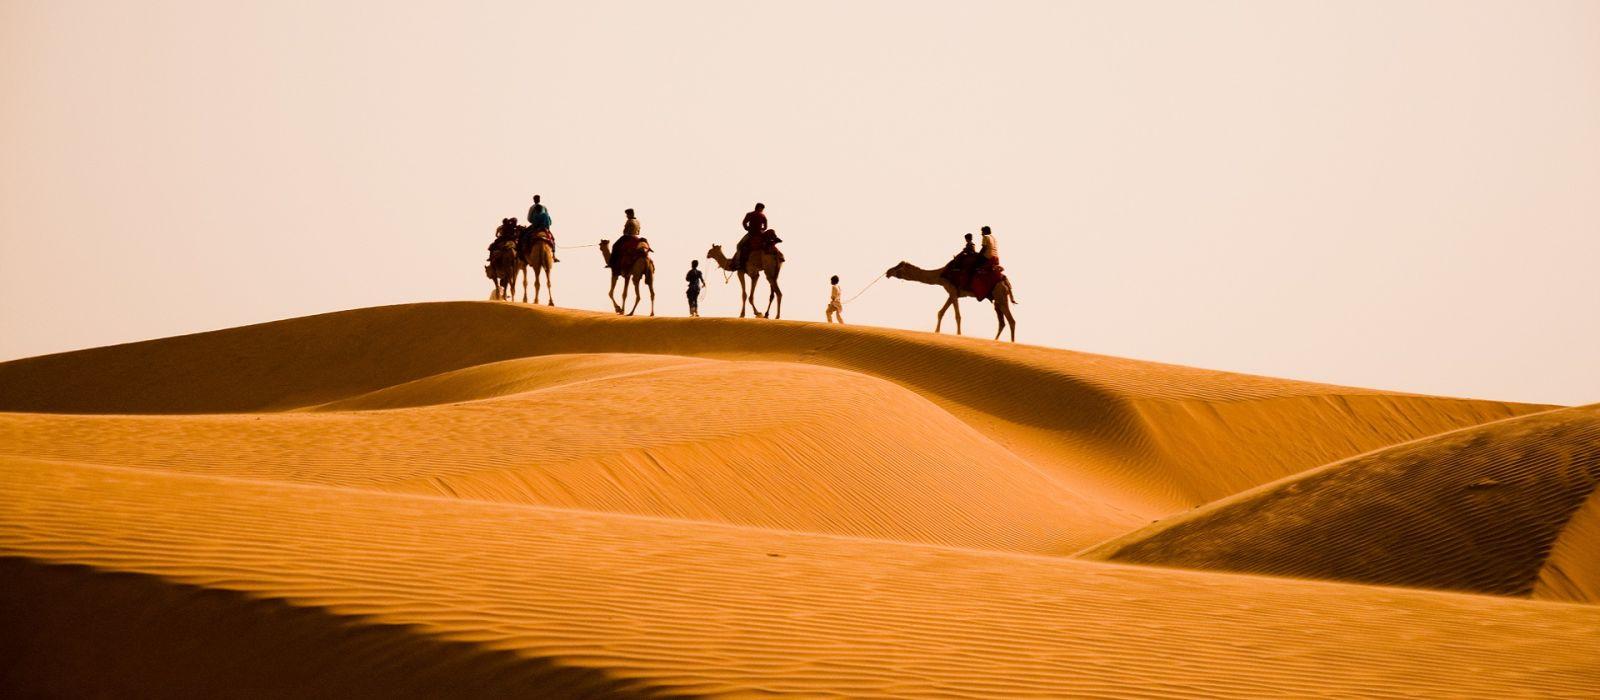 Camel safari tour in Rajasthan, India.